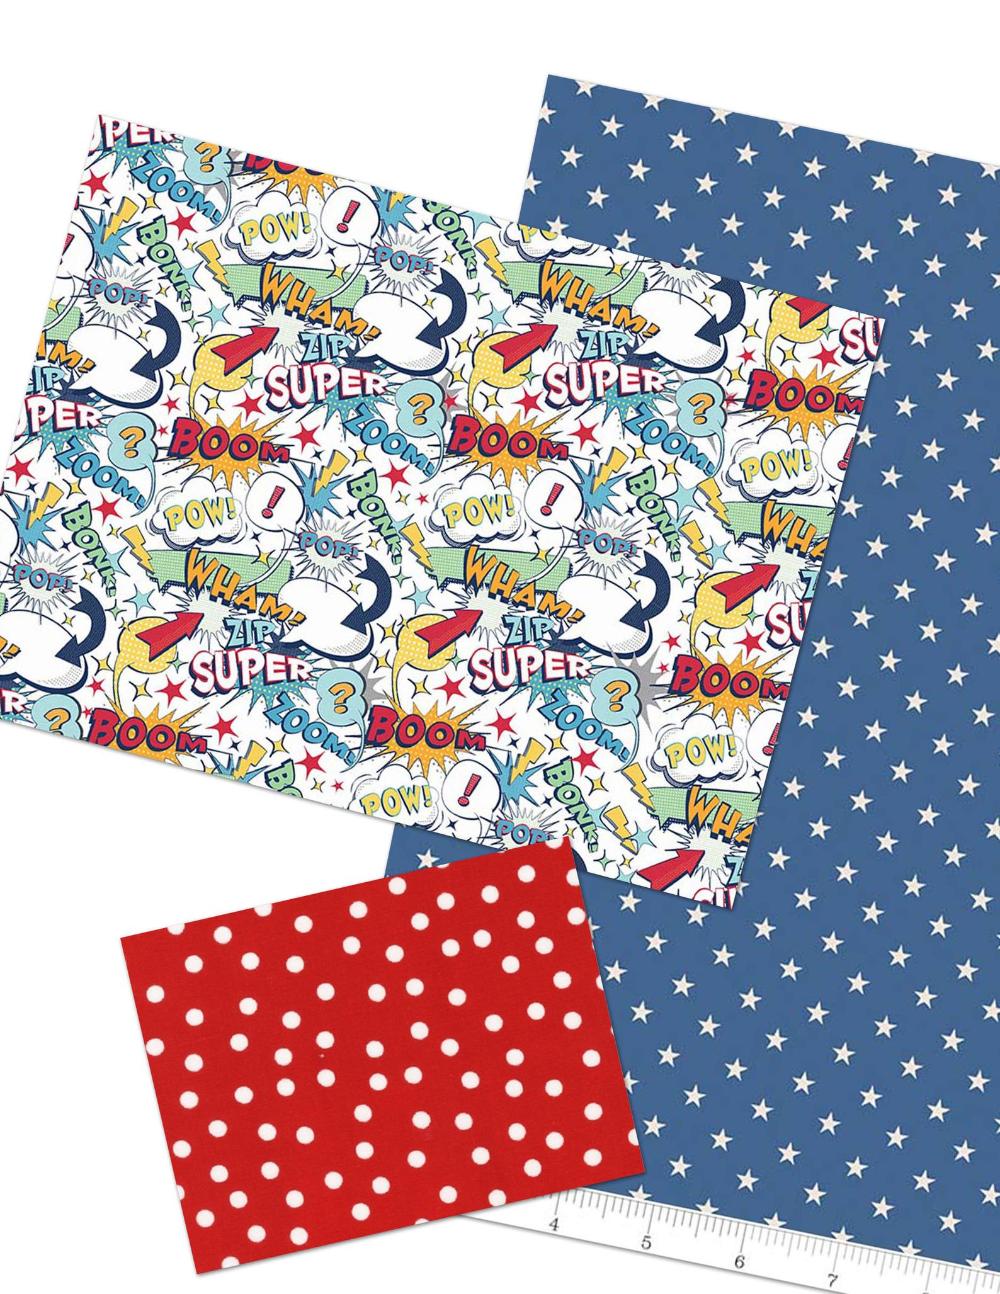 20 X 20 Laminated Cotton Fabric Superhero Words Food Safe Etsy In 2020 Laminated Cotton Fabric Oil Cloth Easy Sewing